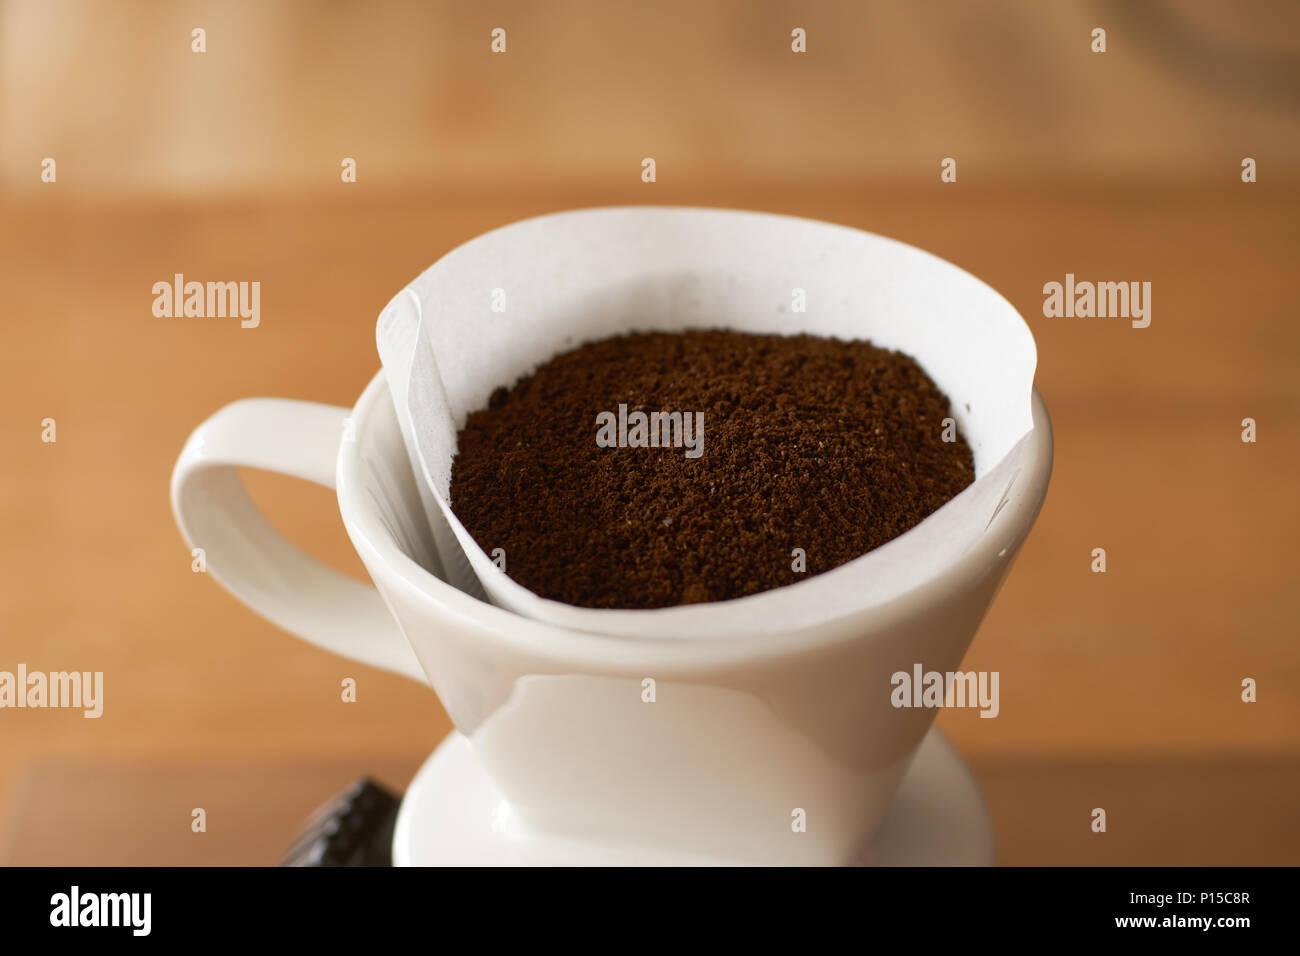 ceramic hand drip coffee brewer (dripper) and drip ground coffee - Stock Image